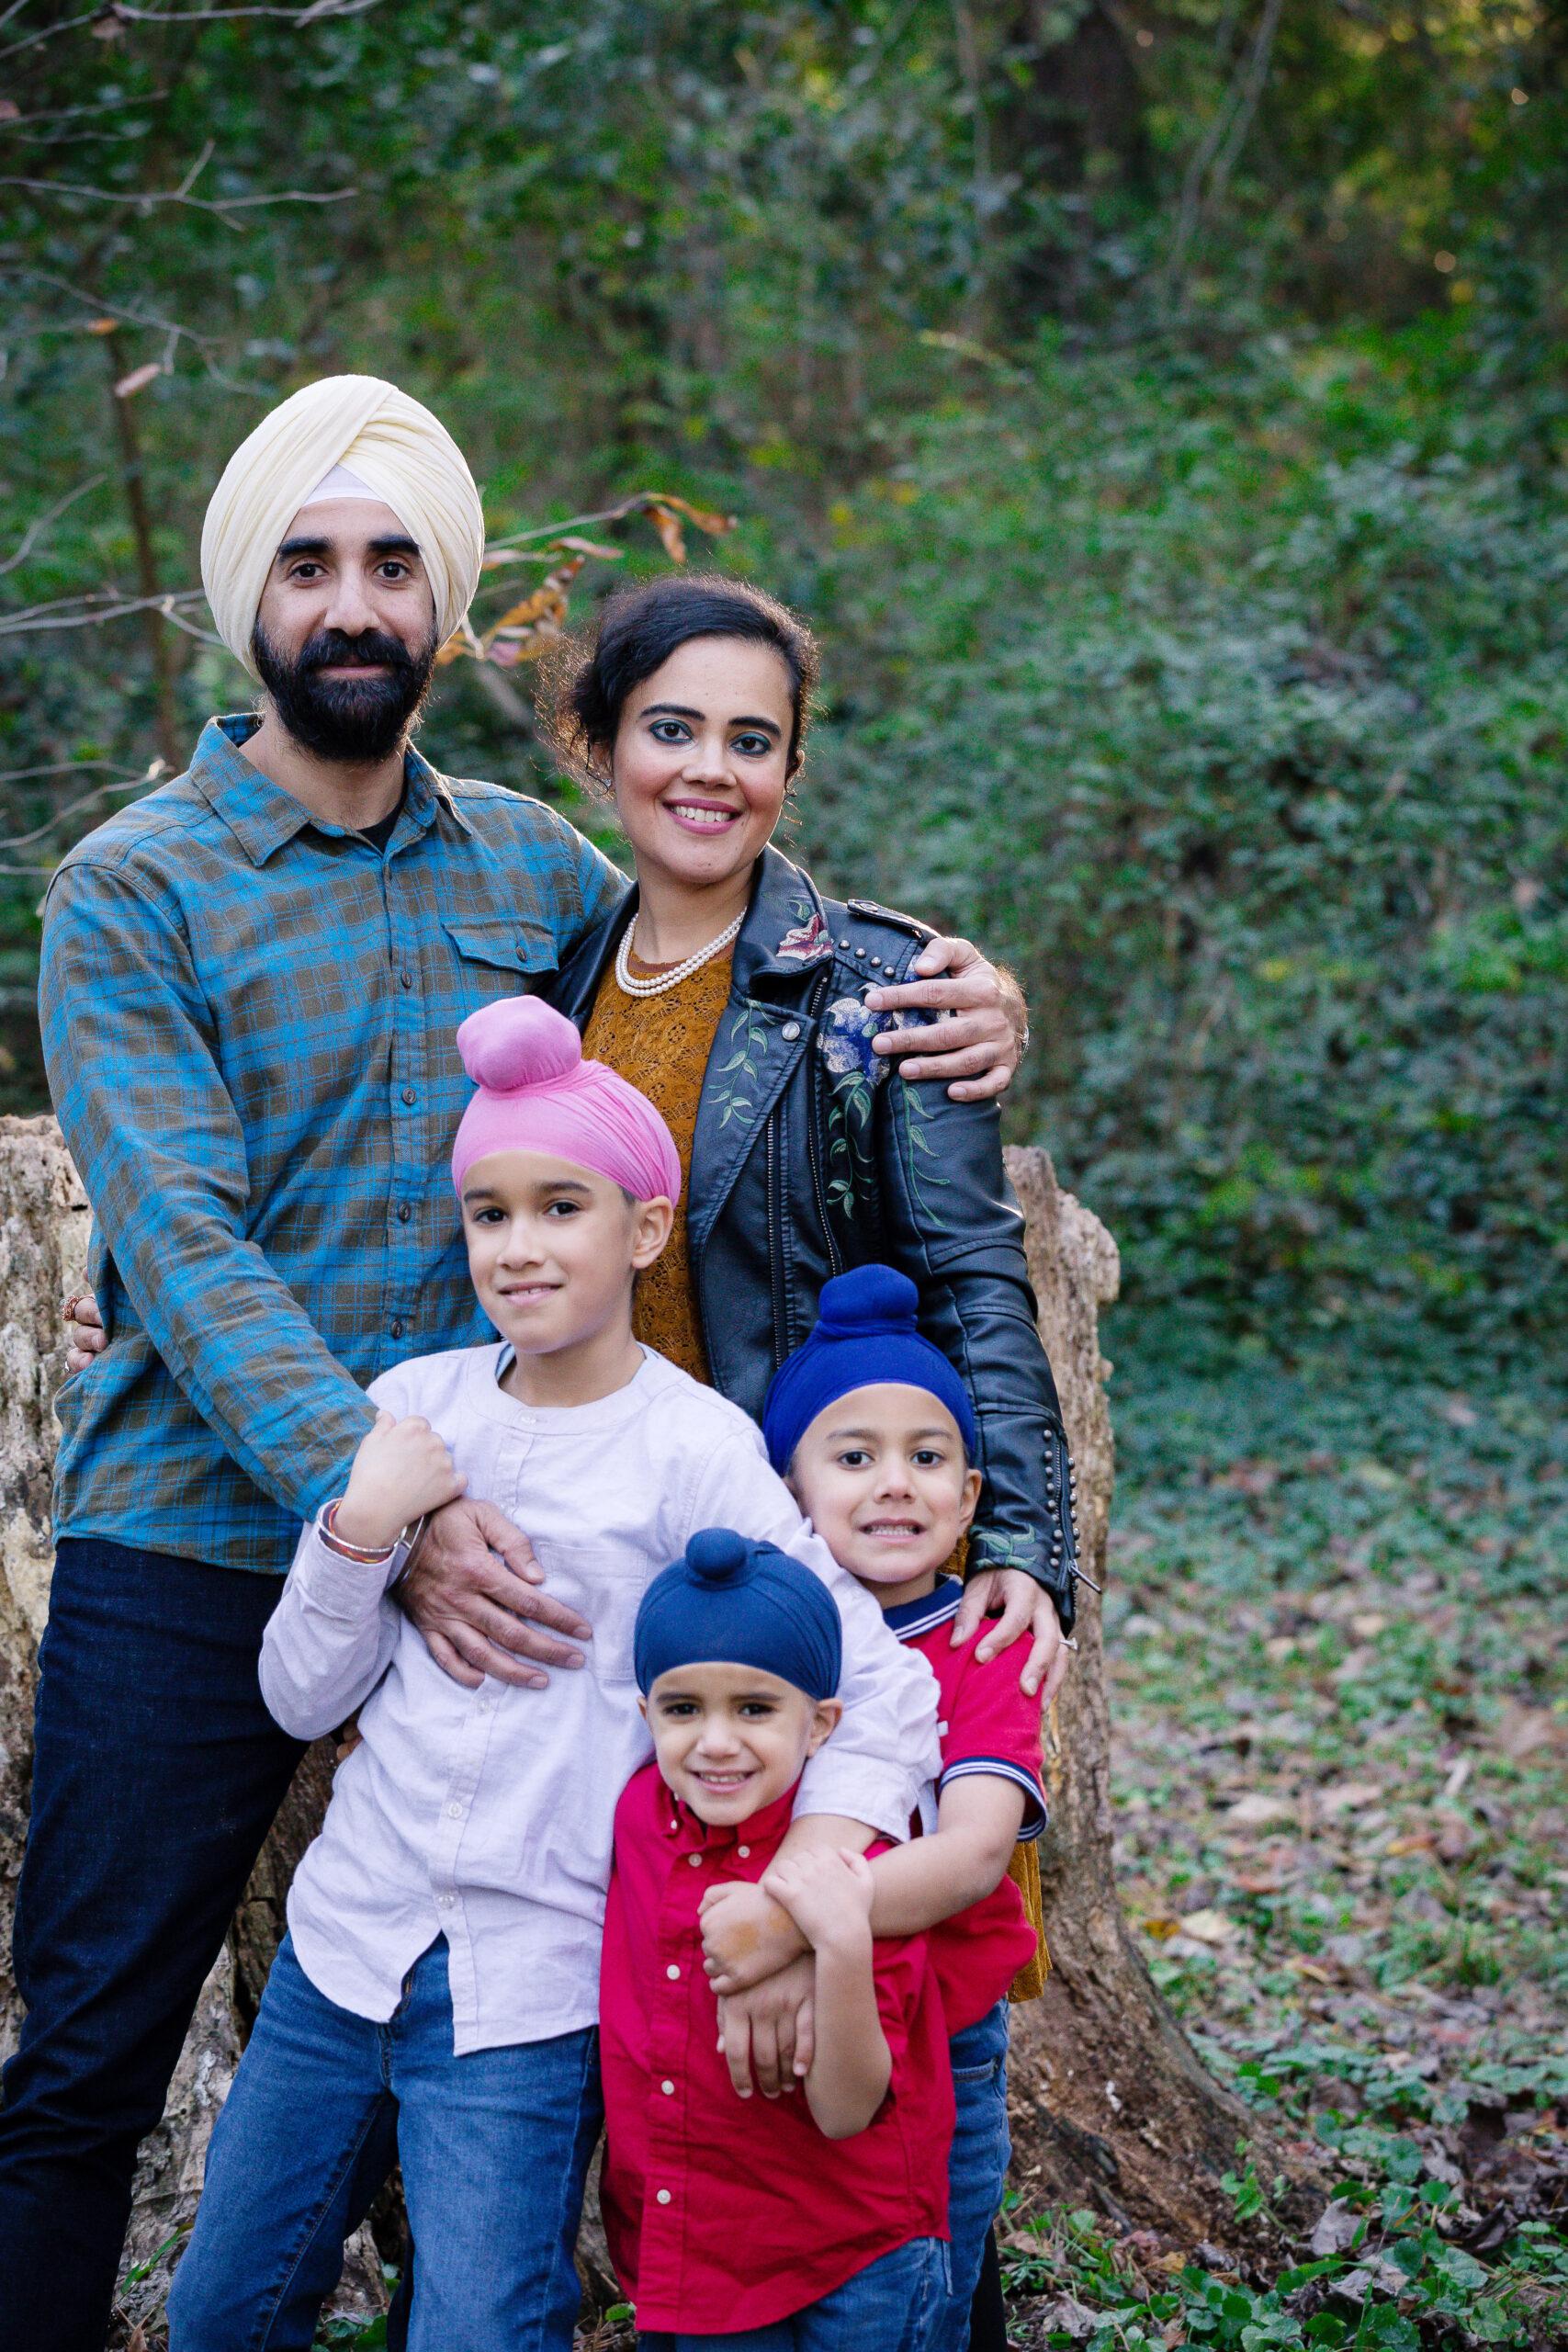 Shanny Kohli and her family